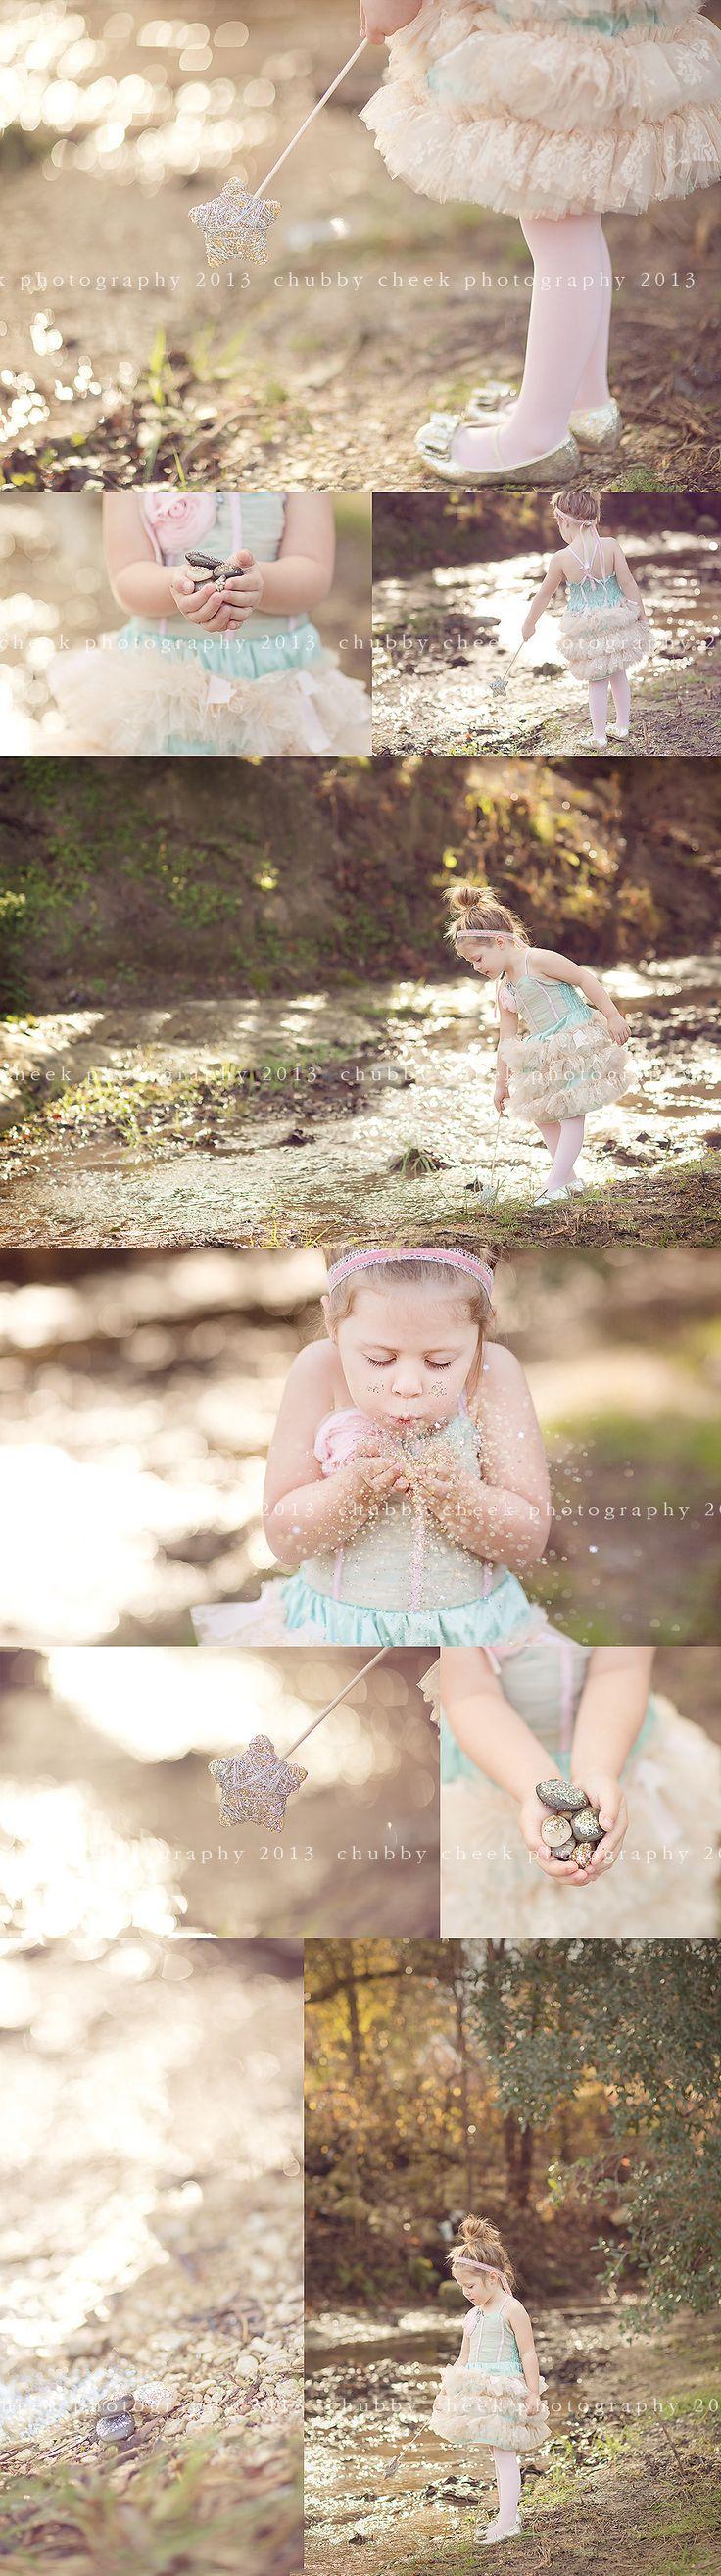 glimmer, shimmer, and shine… houston, tx child photographer – chubby cheek photography | Chubby Cheek Photography Houston, TX Natural Light Photographer #photogpinspiration